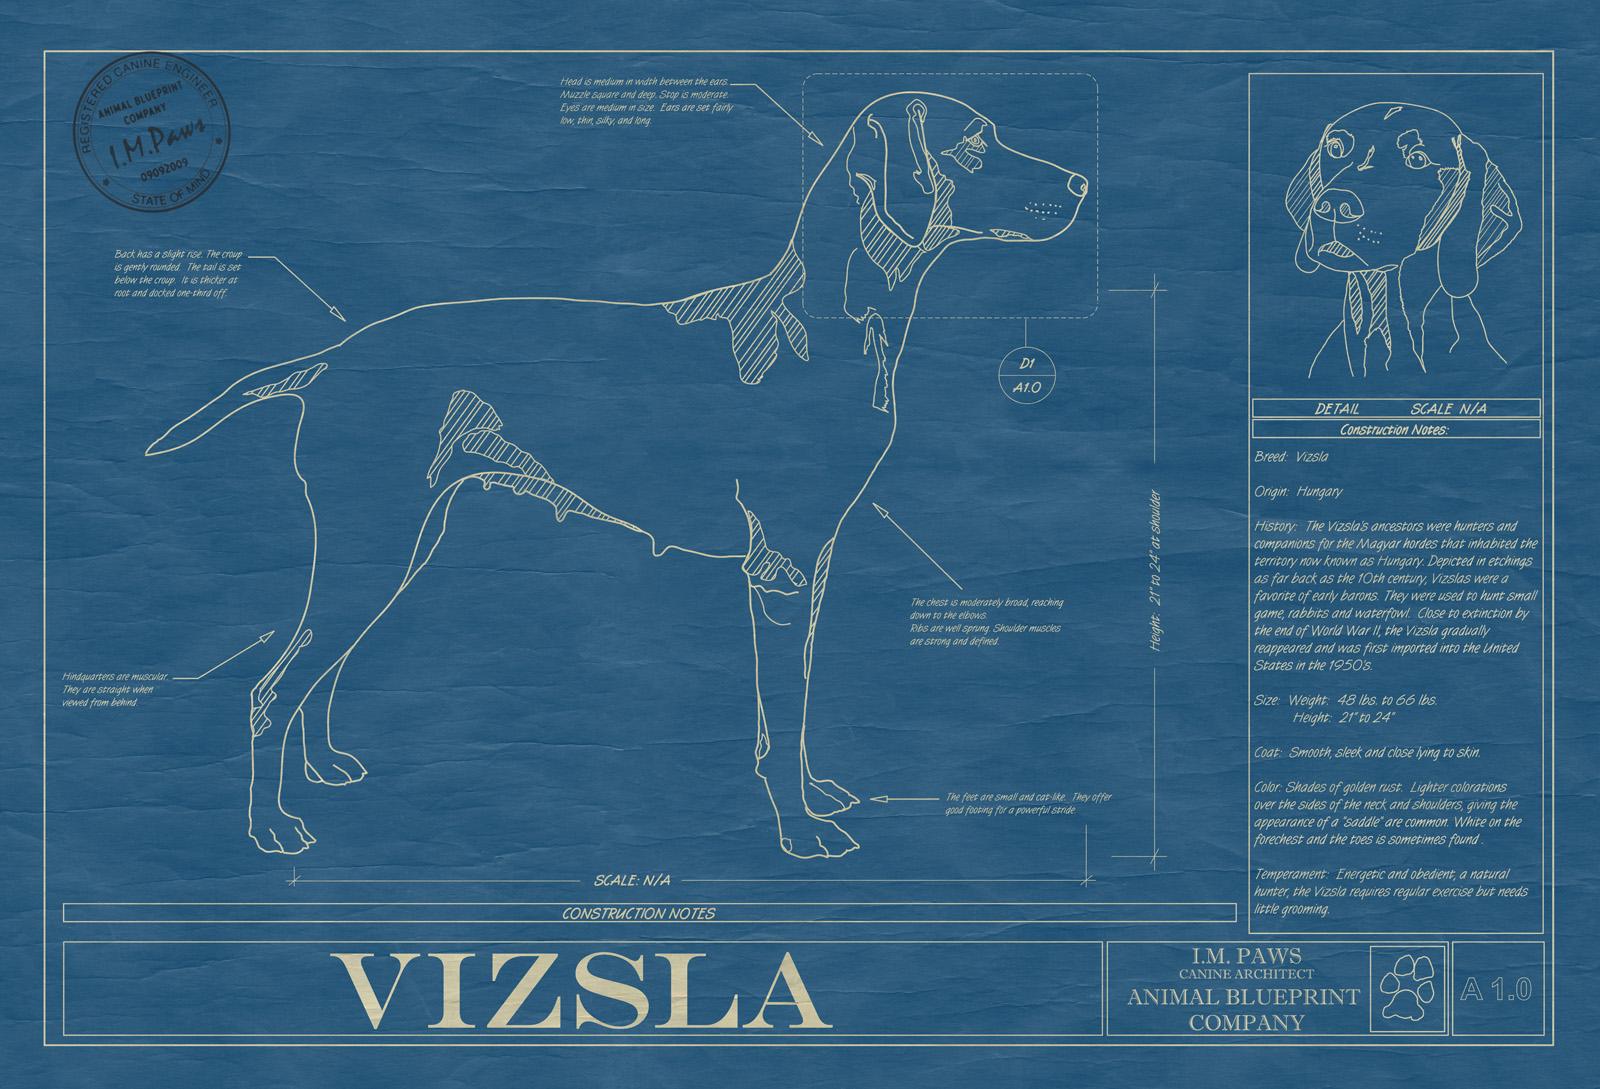 Vizsla animal blueprint company vizsla dog blueprint malvernweather Choice Image